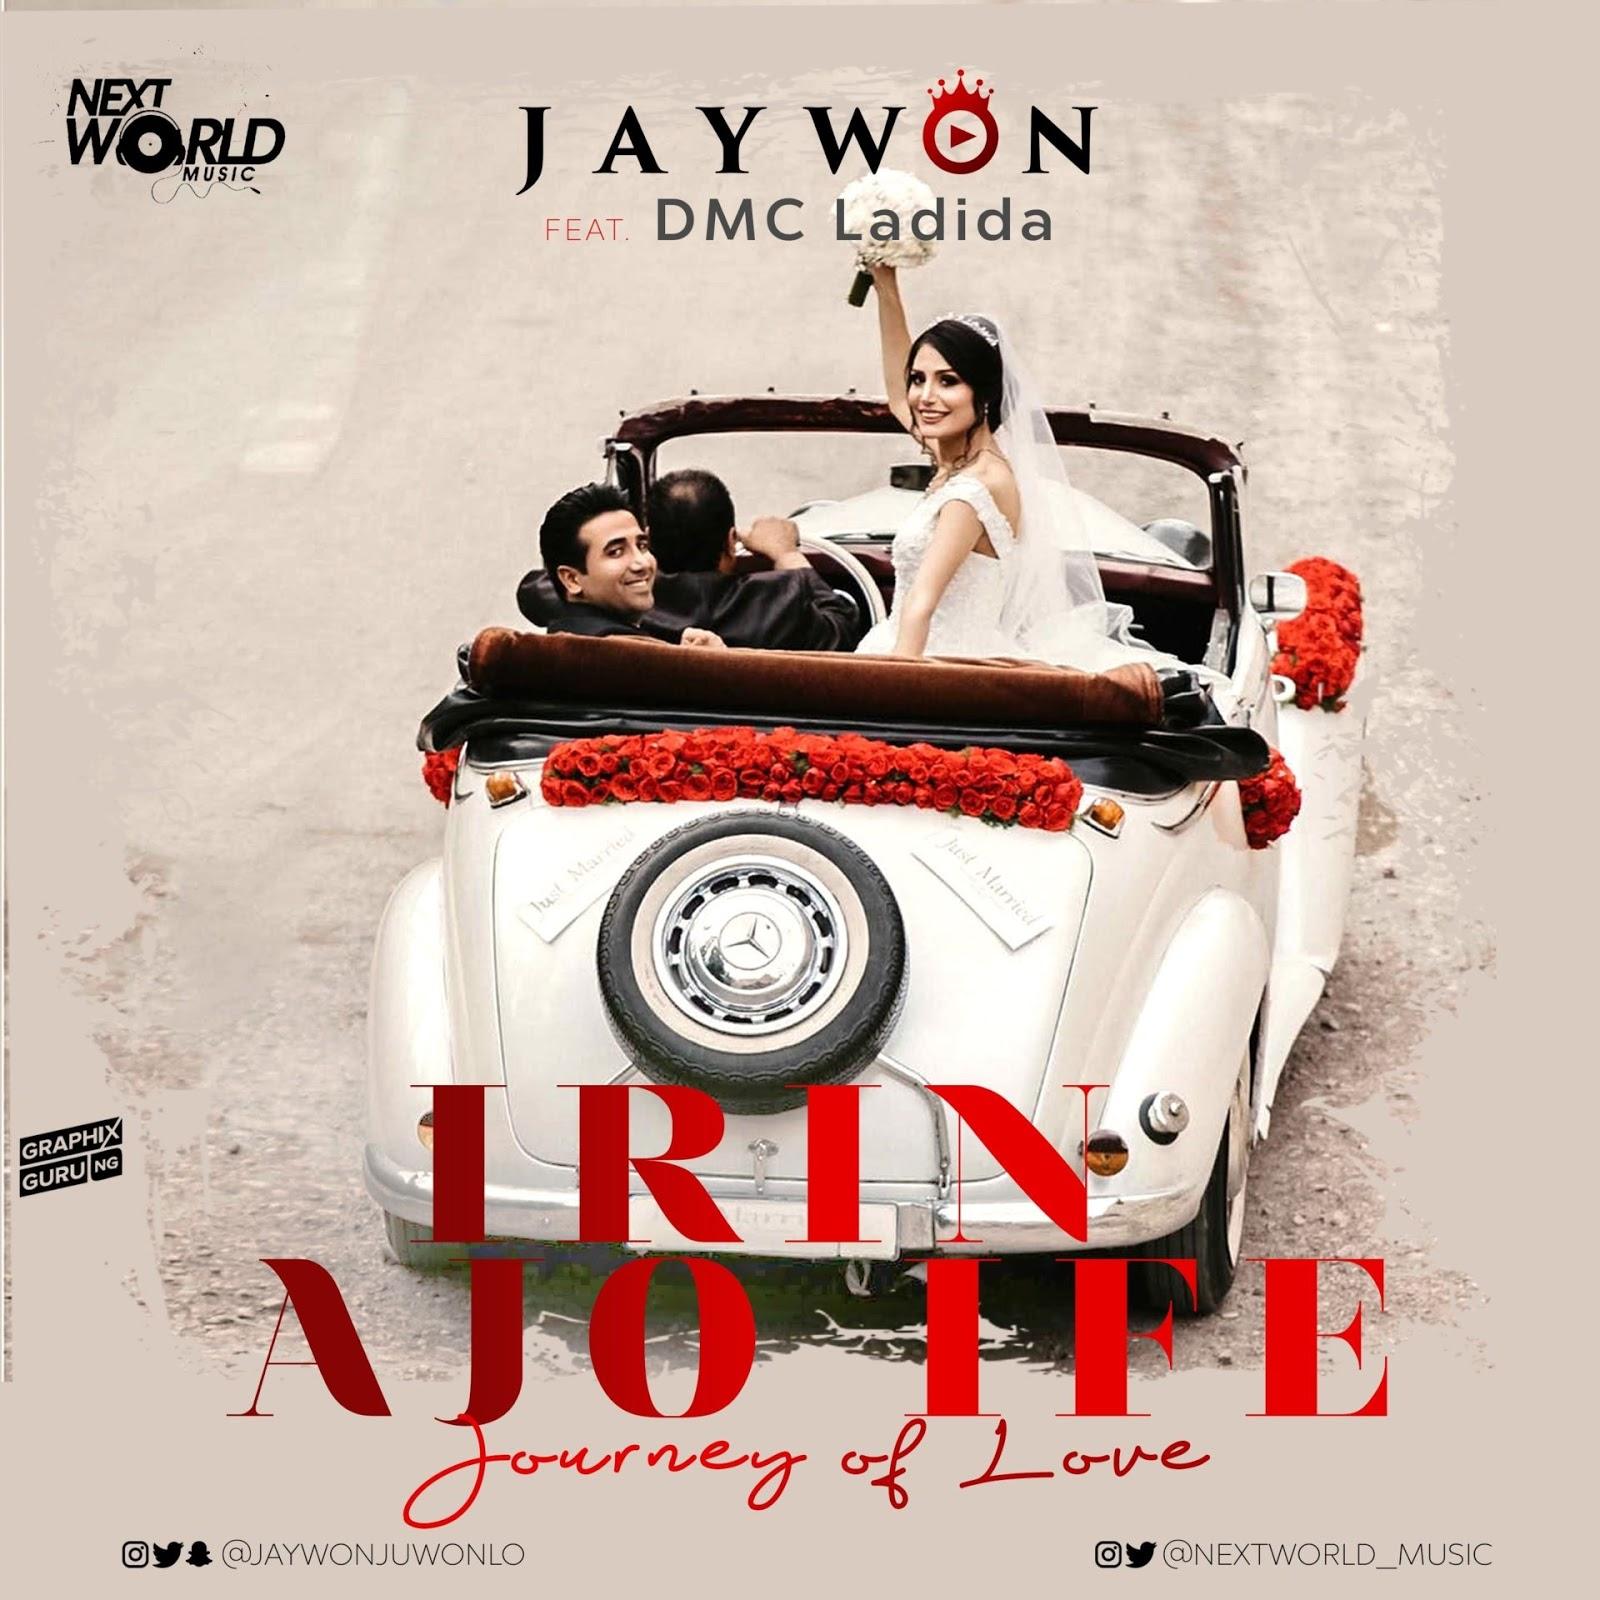 Jaywon Ft. DMC Ladida - Irin Ayo Ife (Official